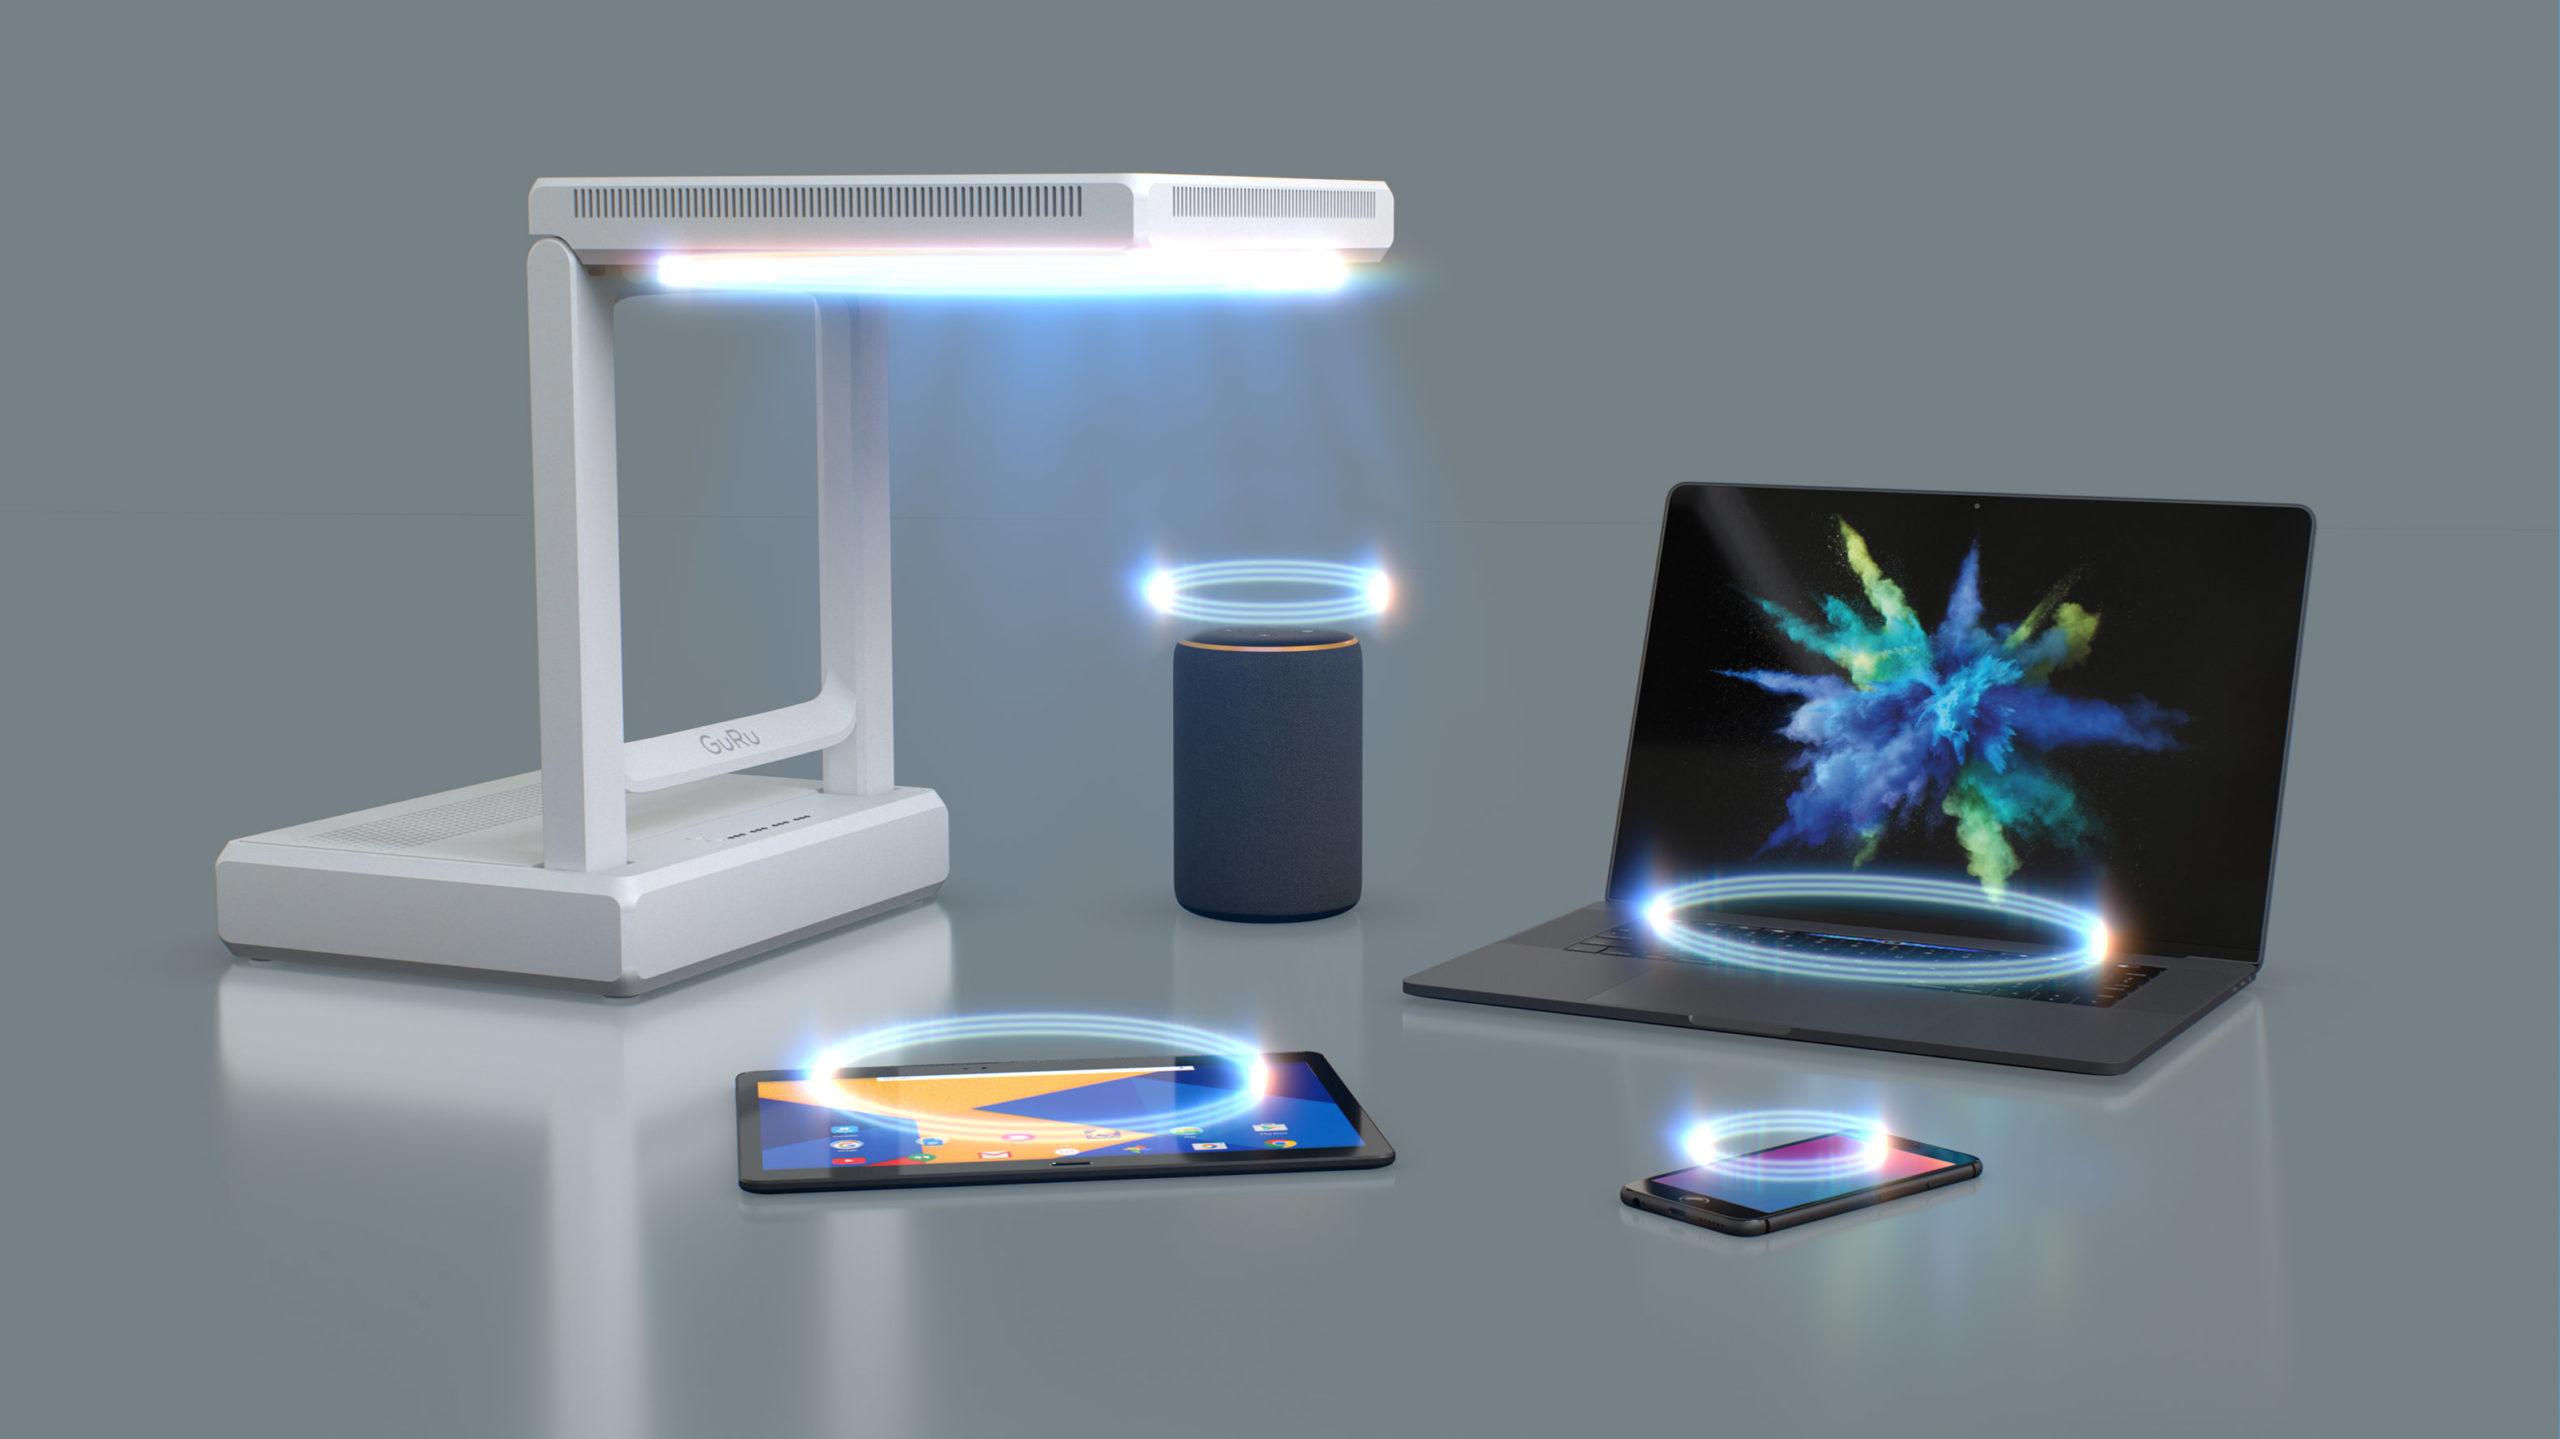 Guru wireless charging system